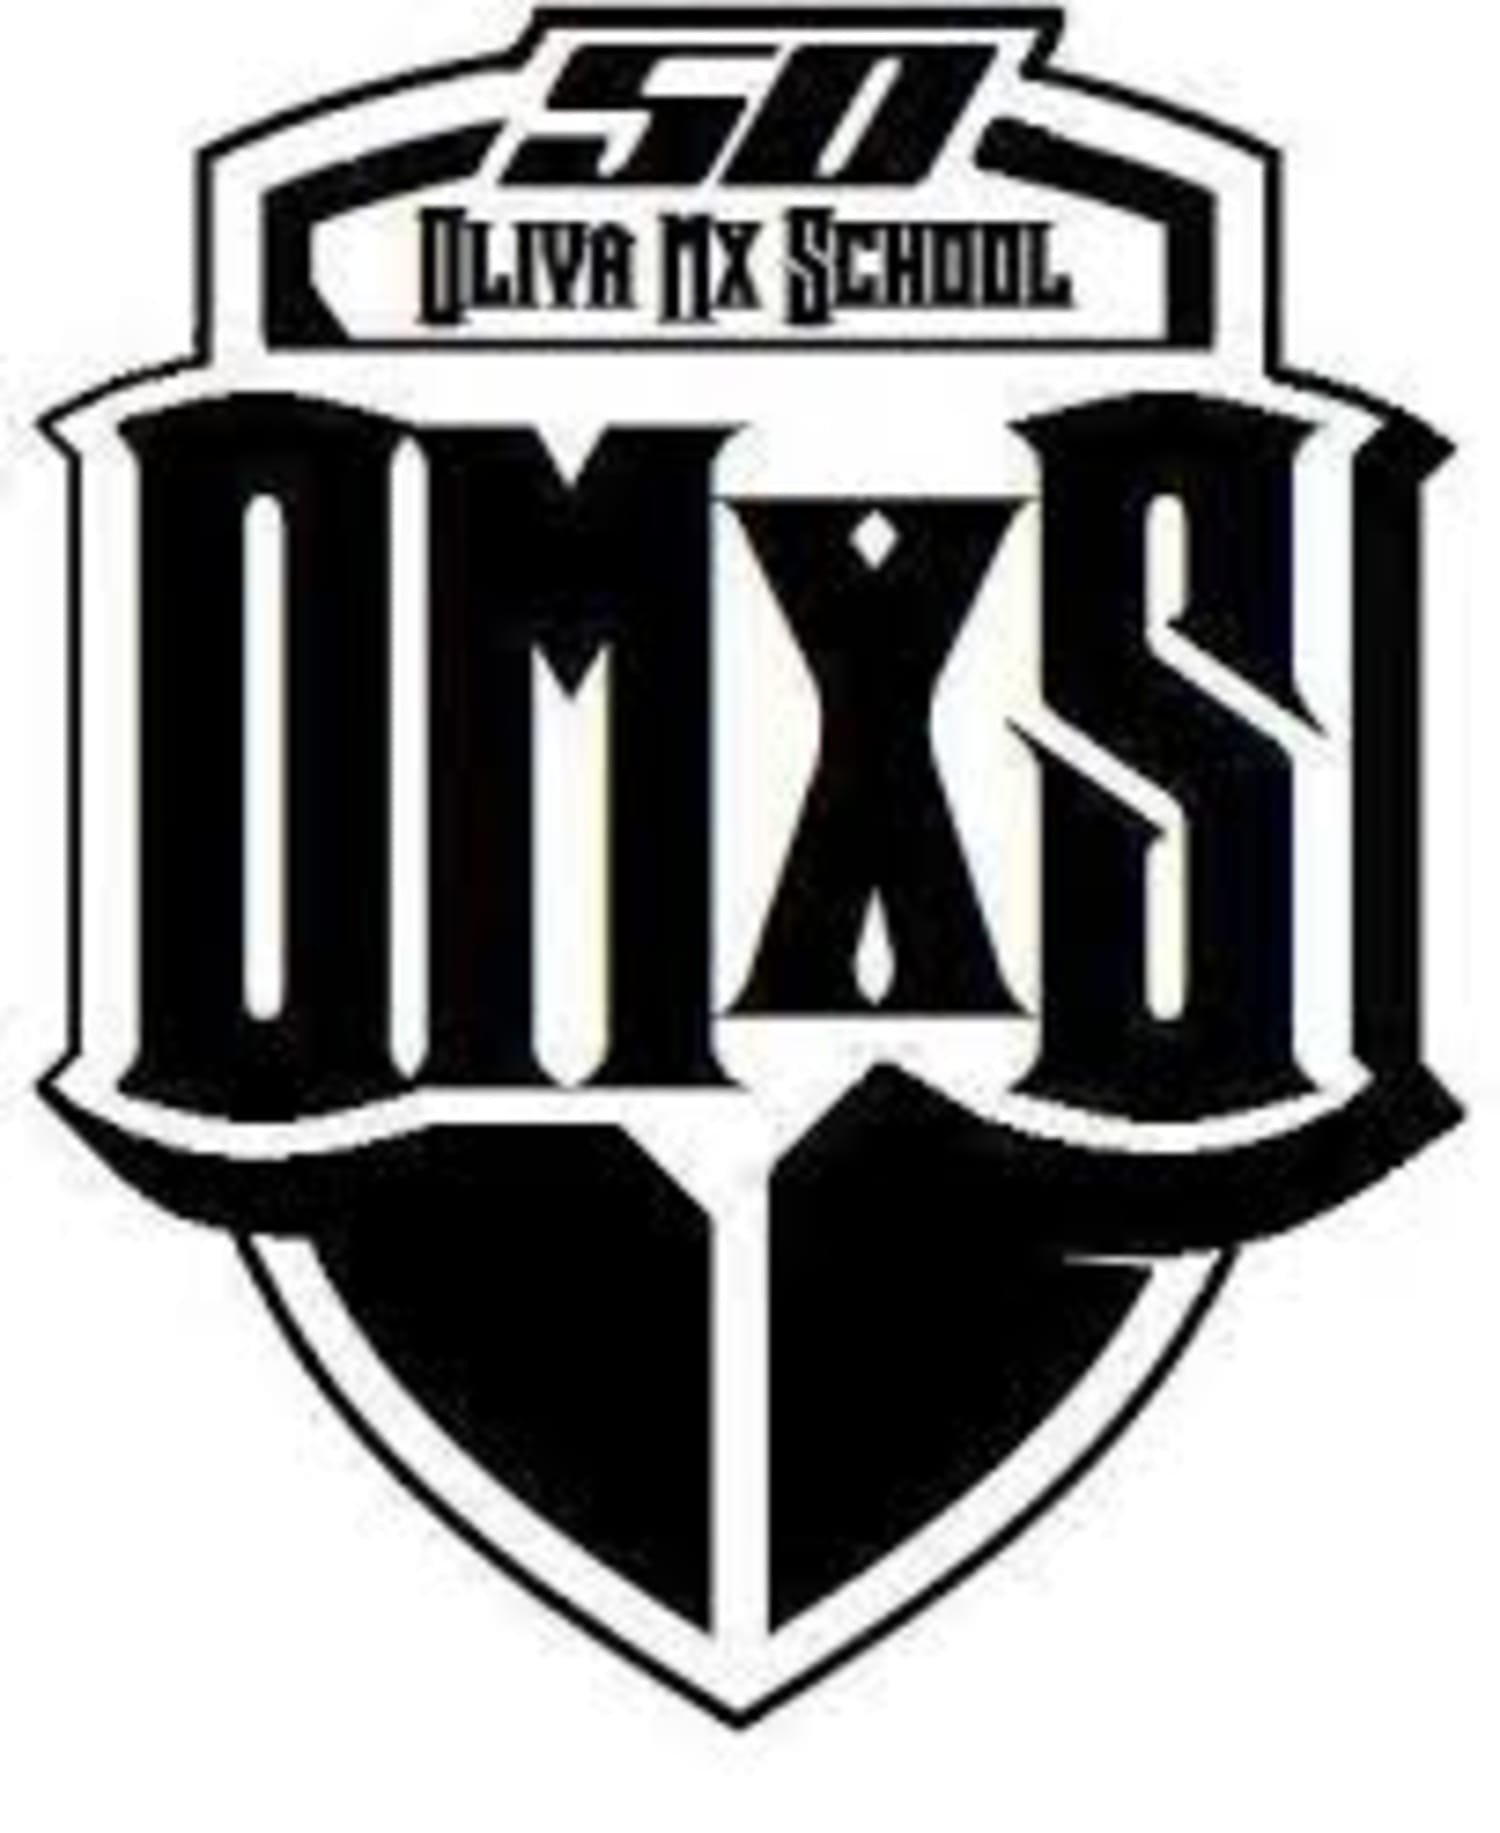 Oliva Mx School